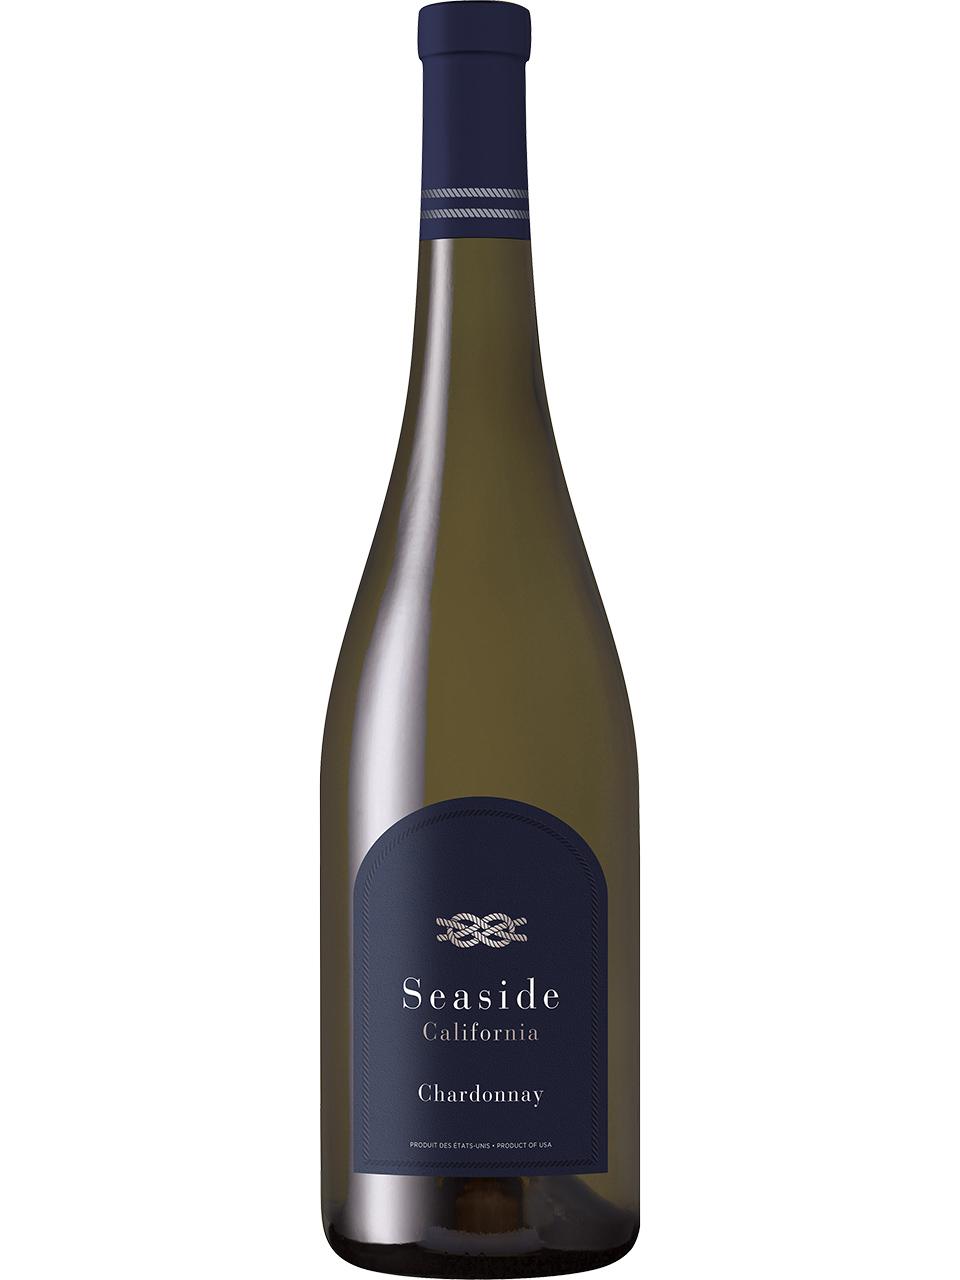 Seaside Chardonnay